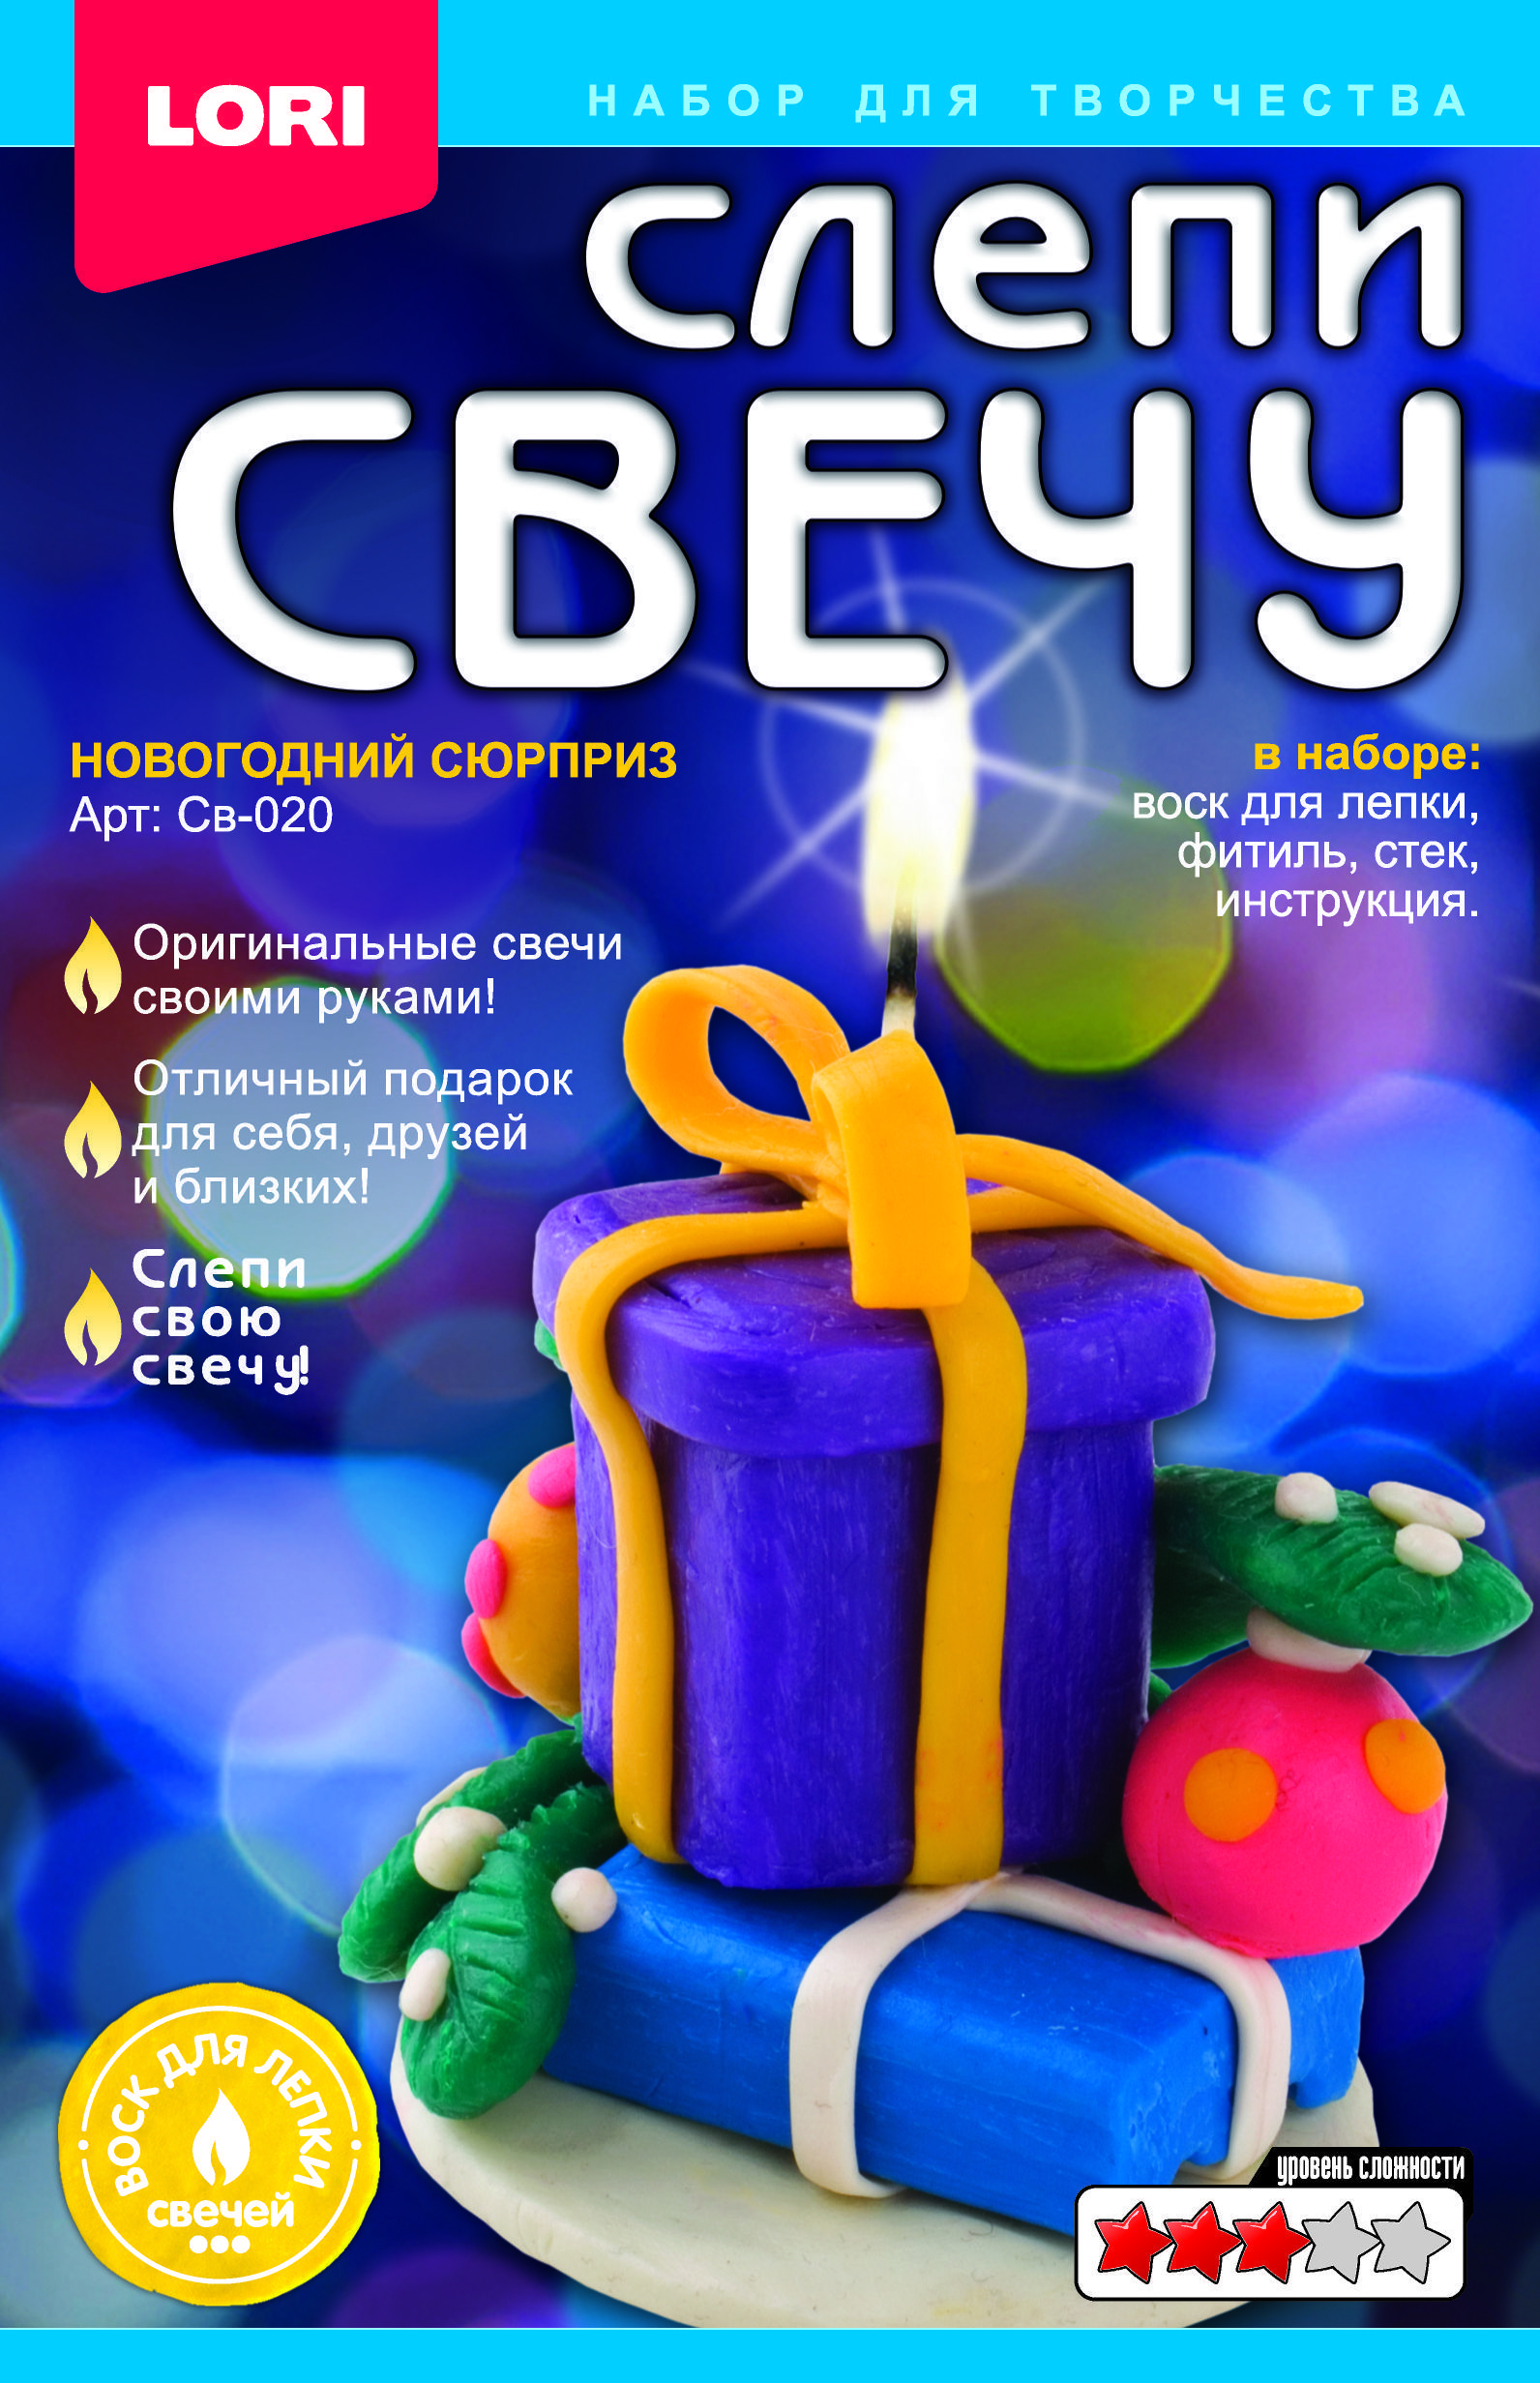 Набор д/тв. лепим свечи НОВОГОДНИЙ СЮРПРИЗ воск